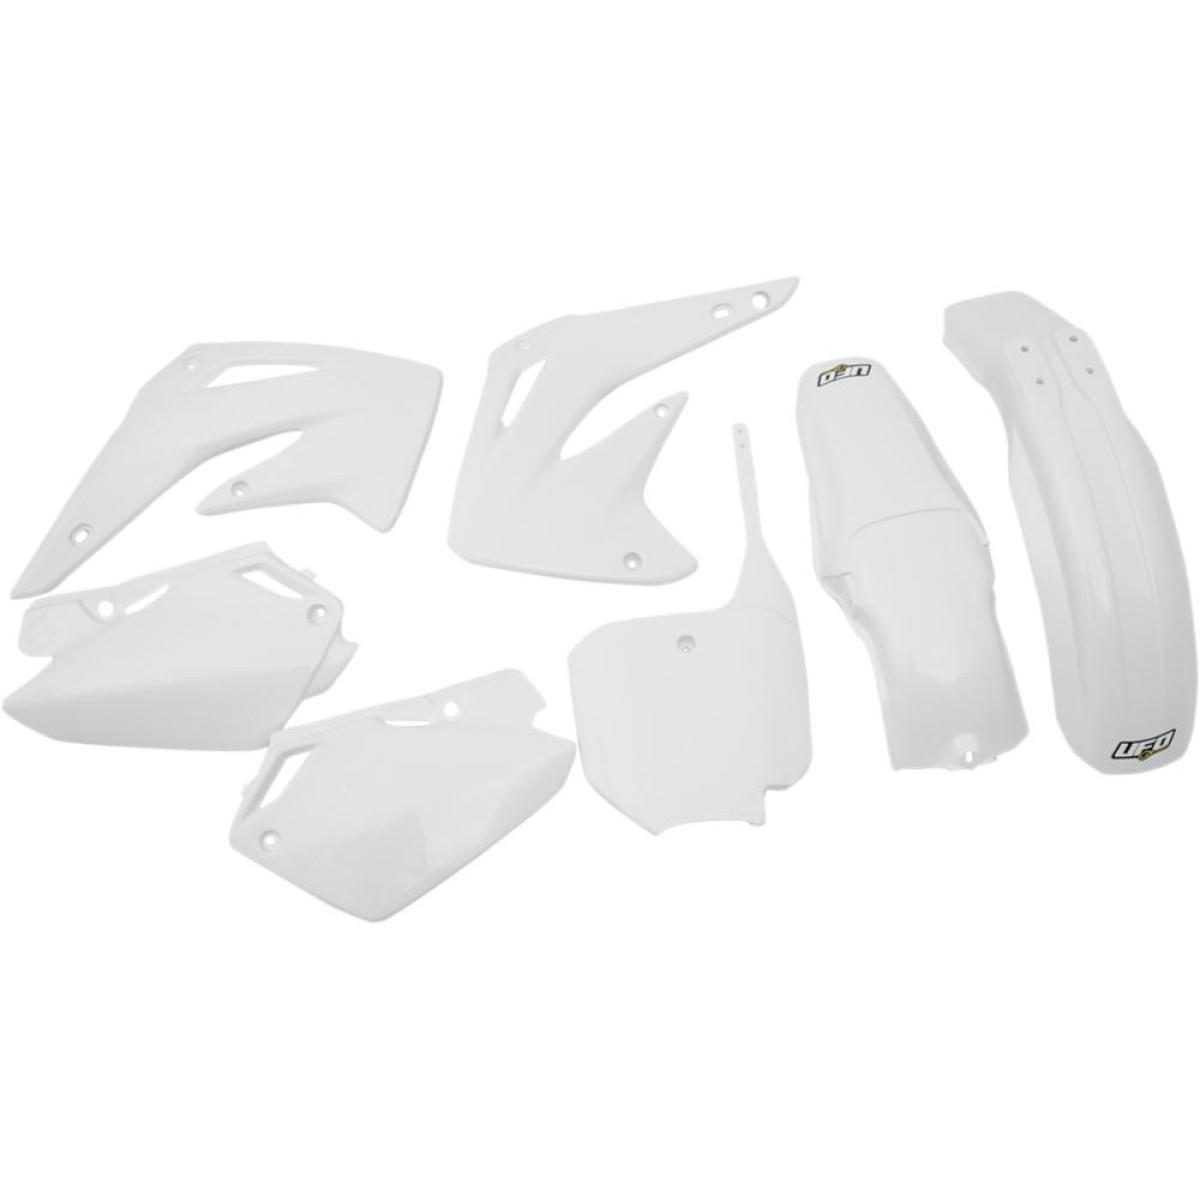 Kit plastique UFO Honda CR 85R 03-07 blanc